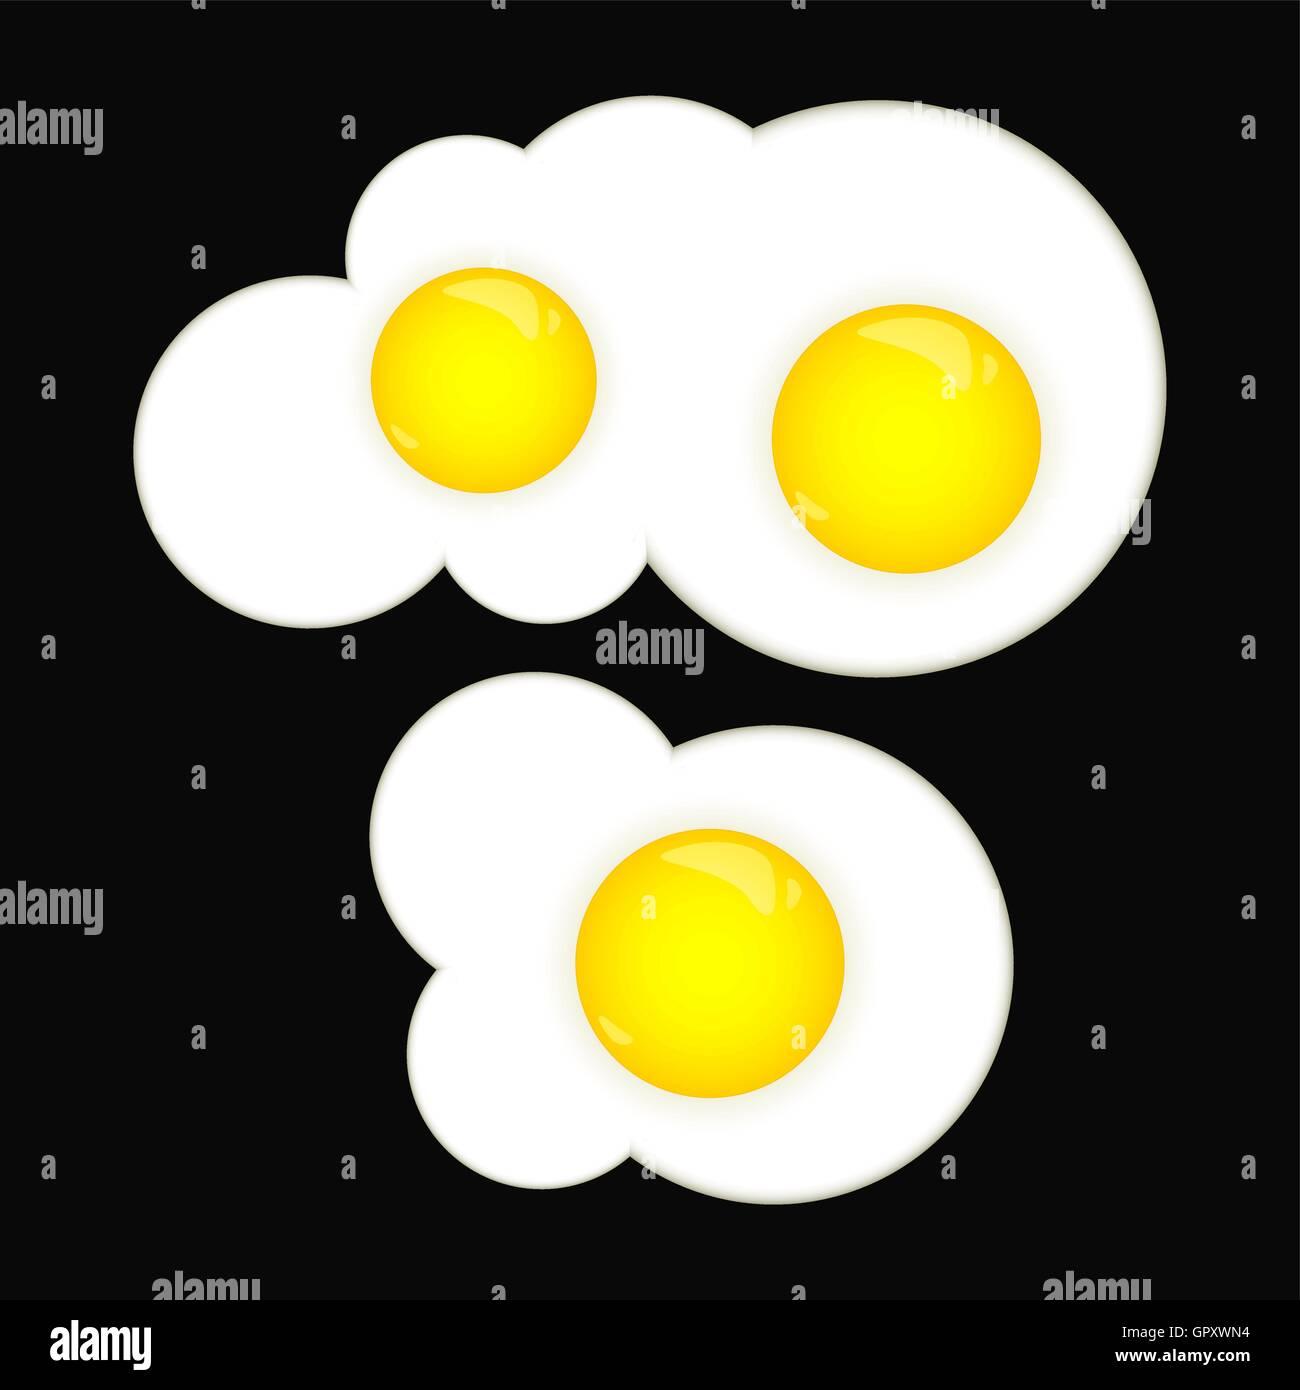 Fried eggs - Stock Vector